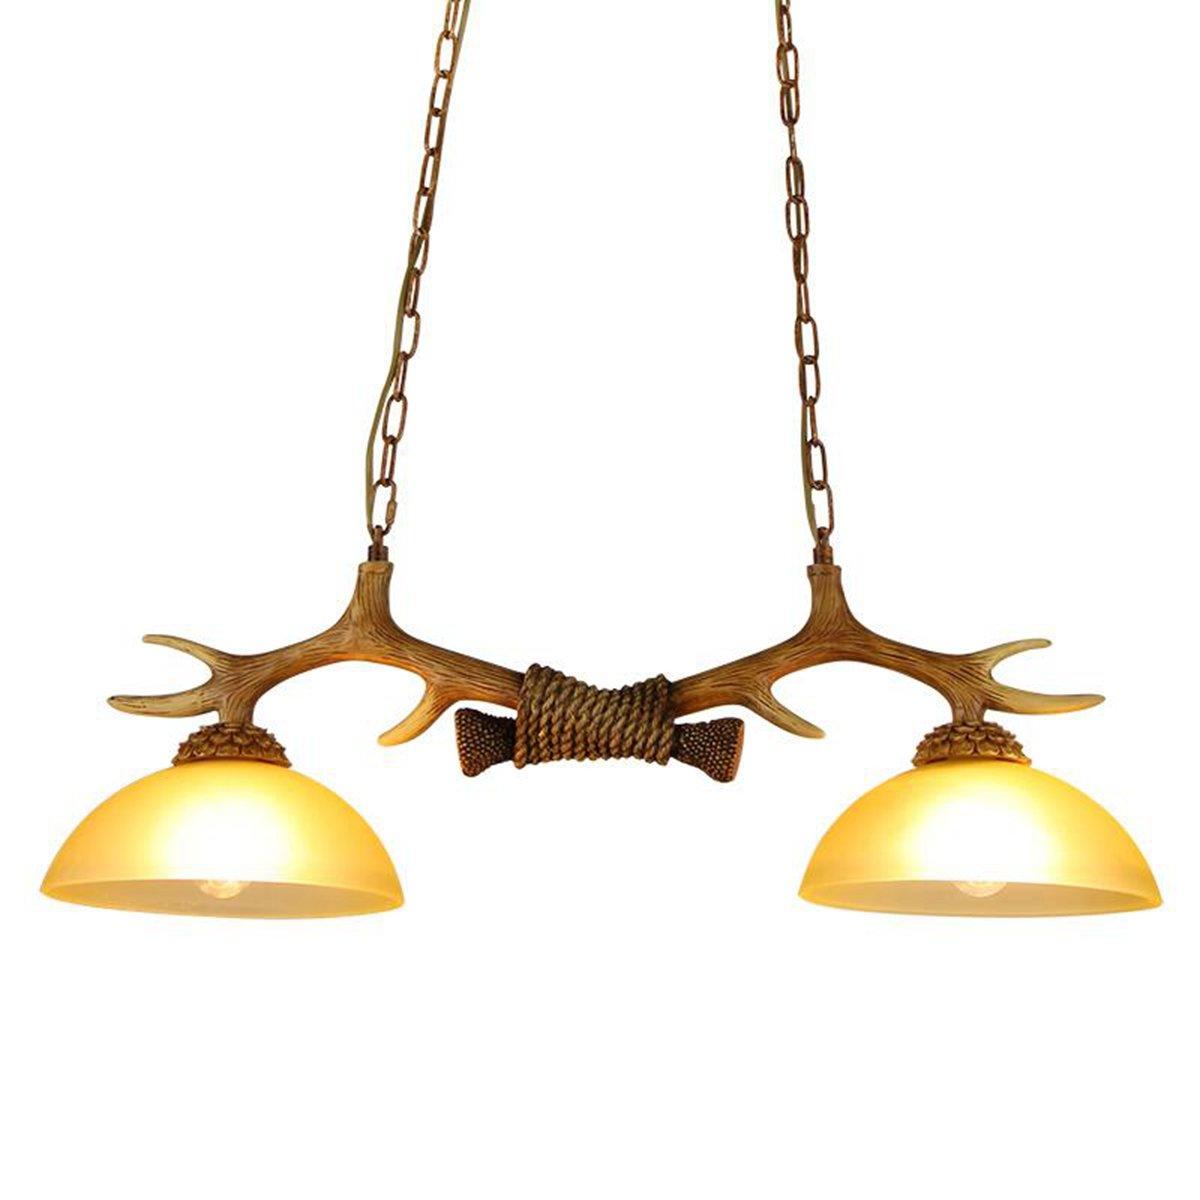 2 Lamps Antlers Kitchen Island Pendant Lights Chandeliers Double R H Antique Ceiling Lights Dining Room Island Light Vintage Antler Hanging Lamp